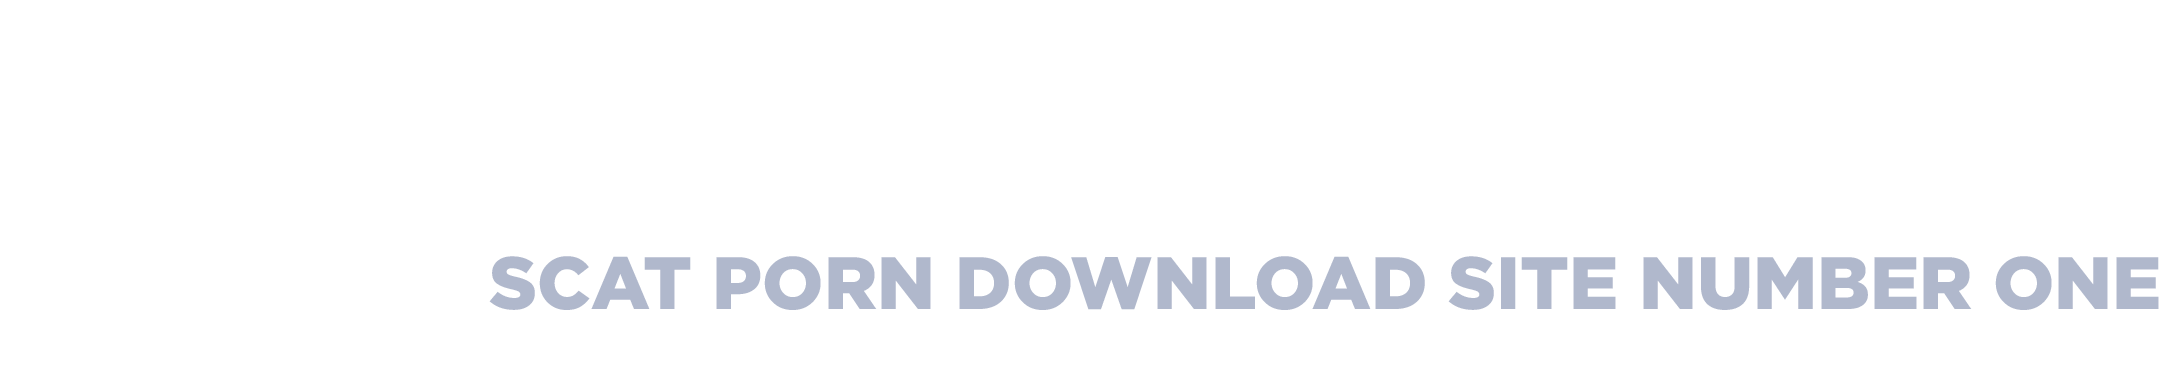 Copro Porn Site #1